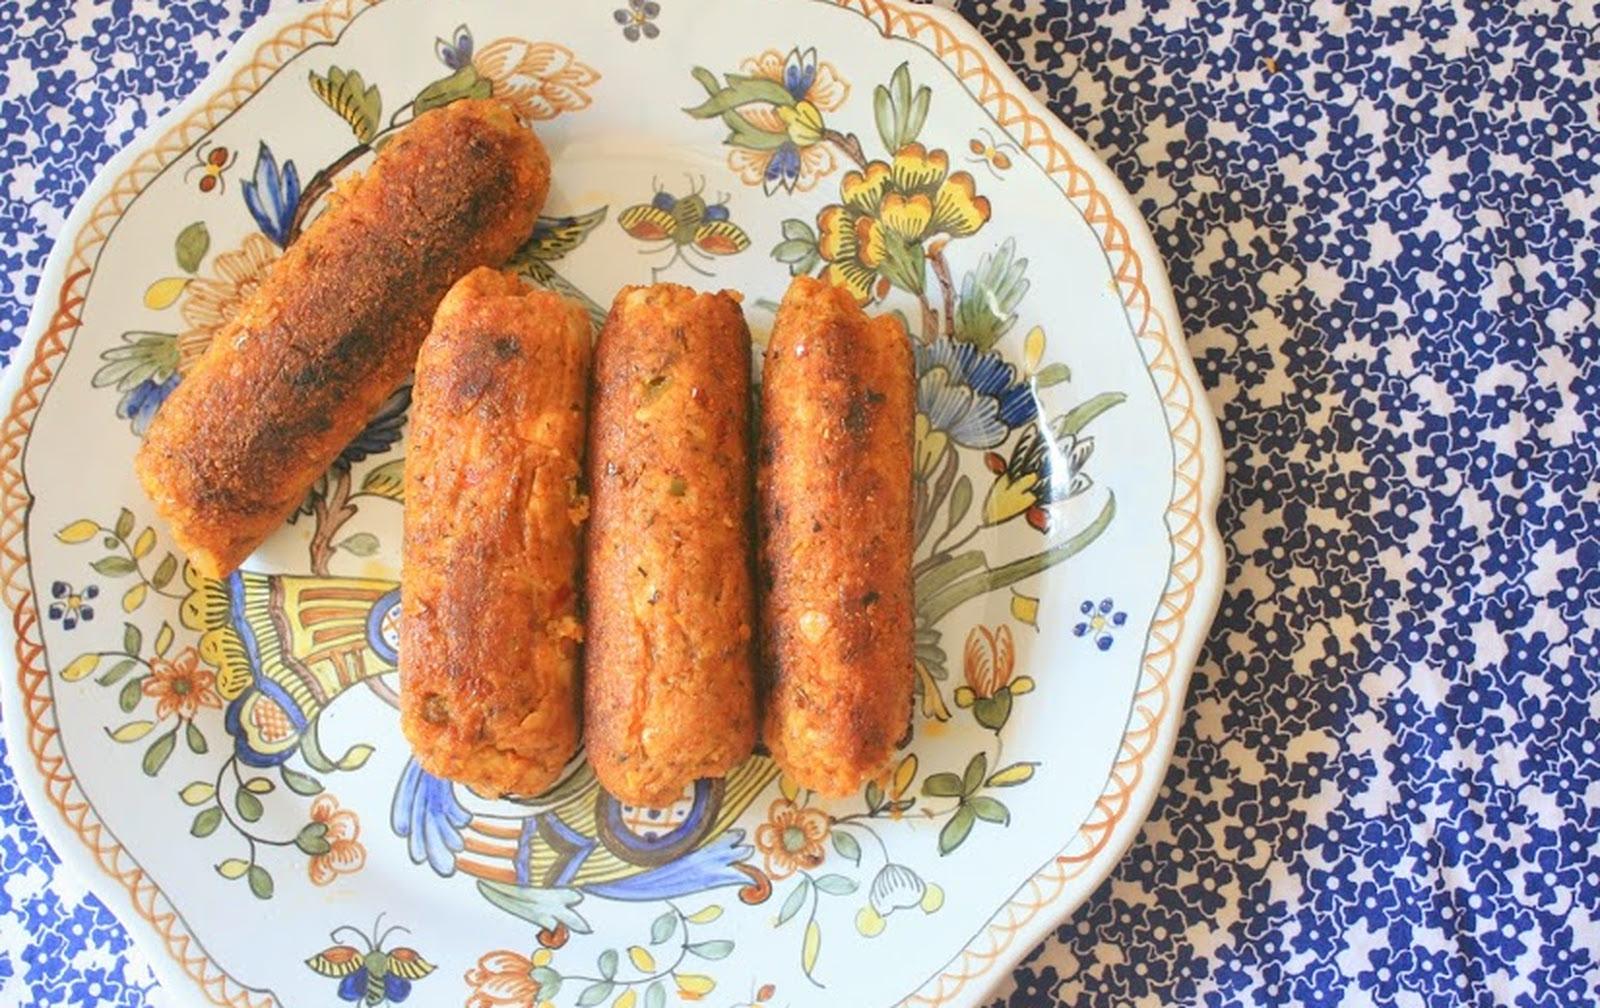 Homemade Andouille Sausages [Vegan, Gluten-Free]